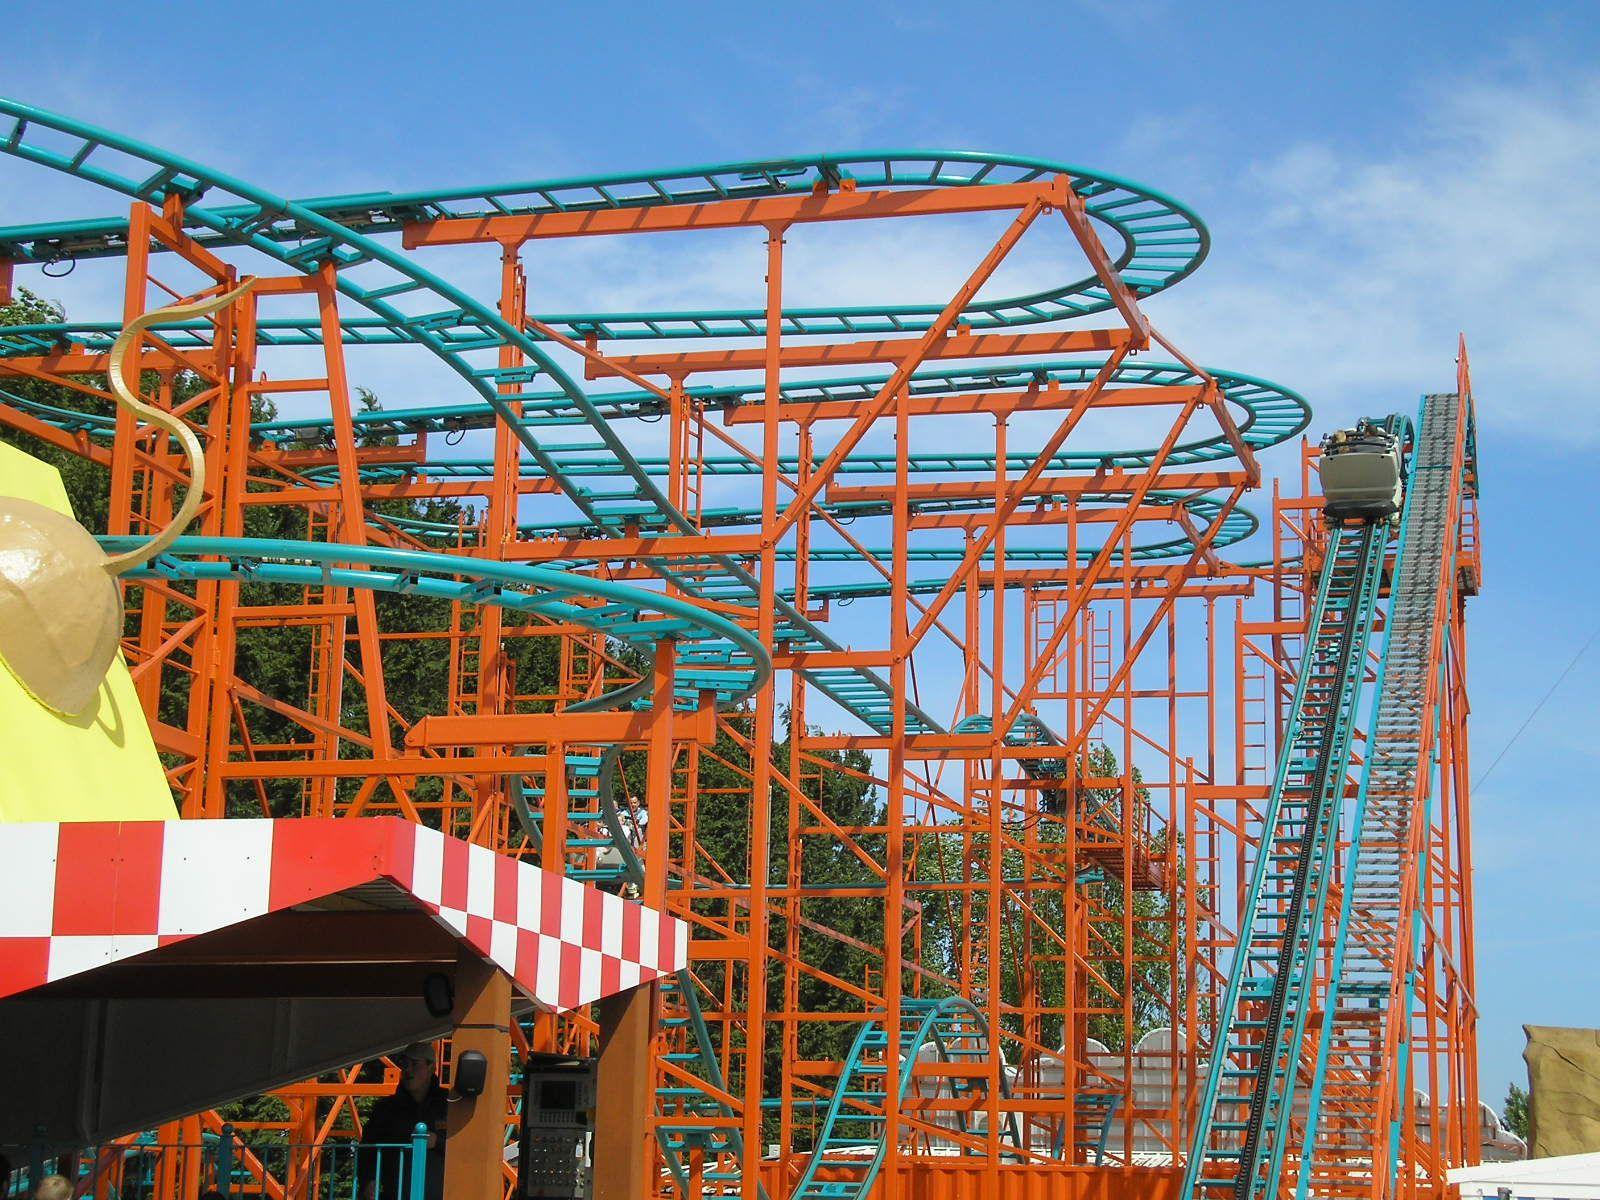 Wild Mouse Coaster Ride